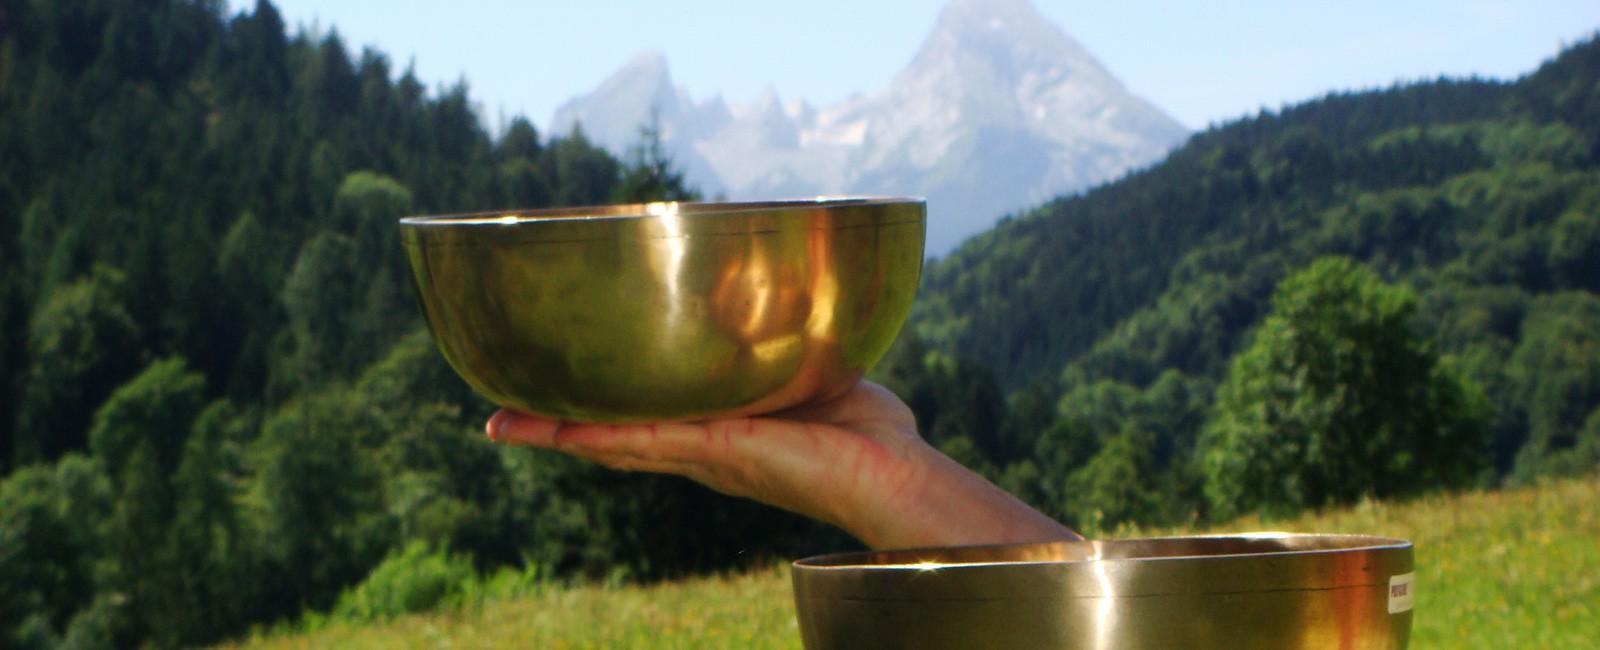 Klangschalentherapie Berchtesgaden